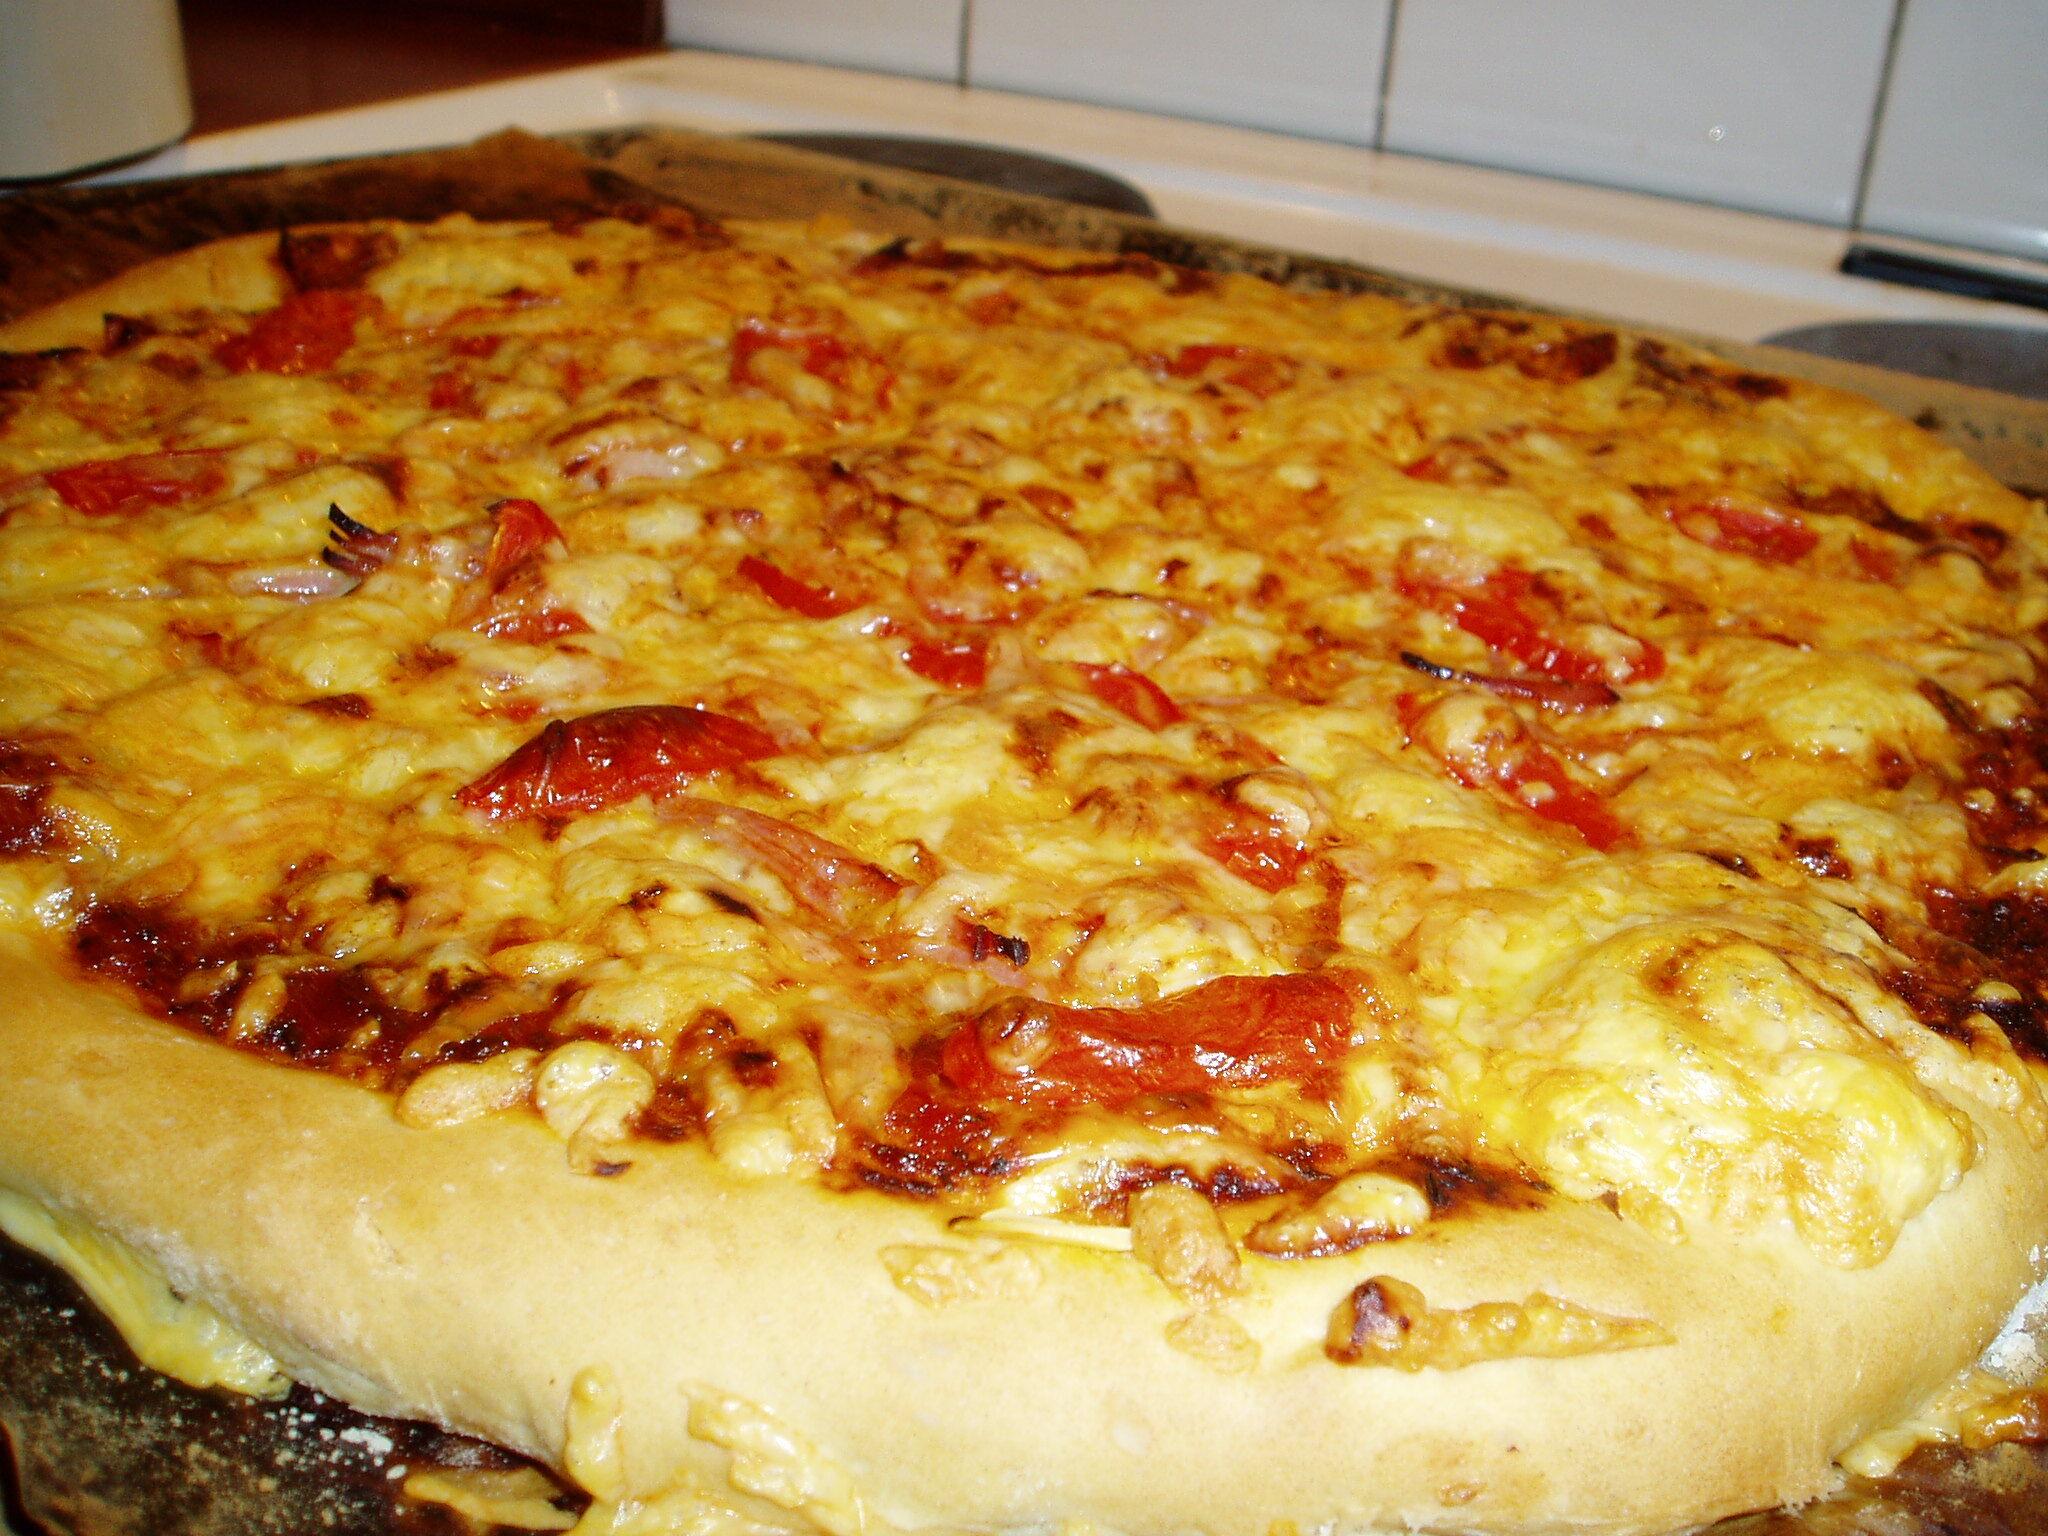 tjock pizza botten